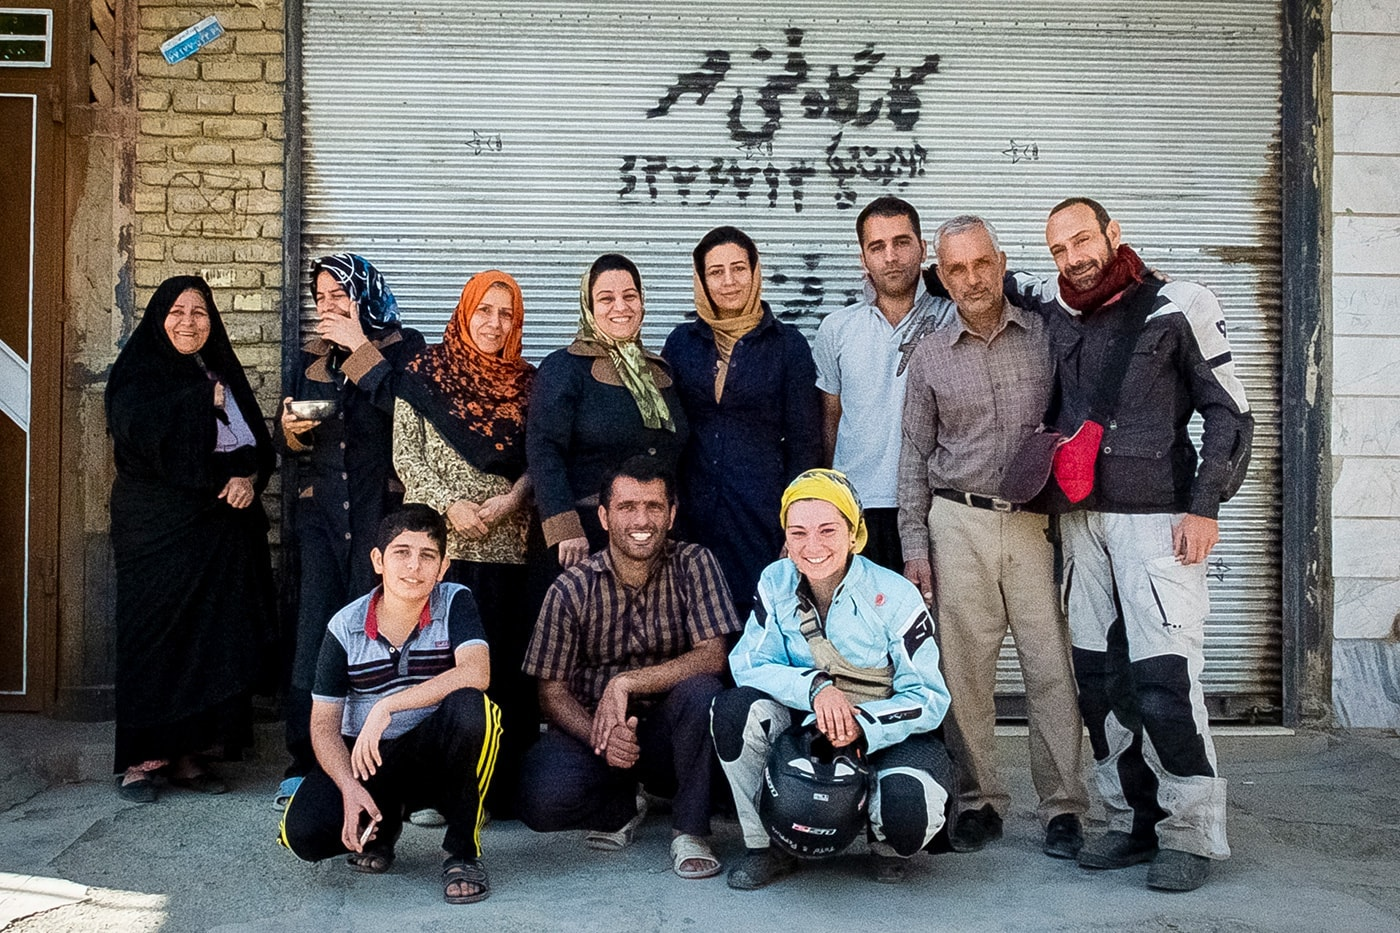 ospitalita iraniana gruppo famiglia